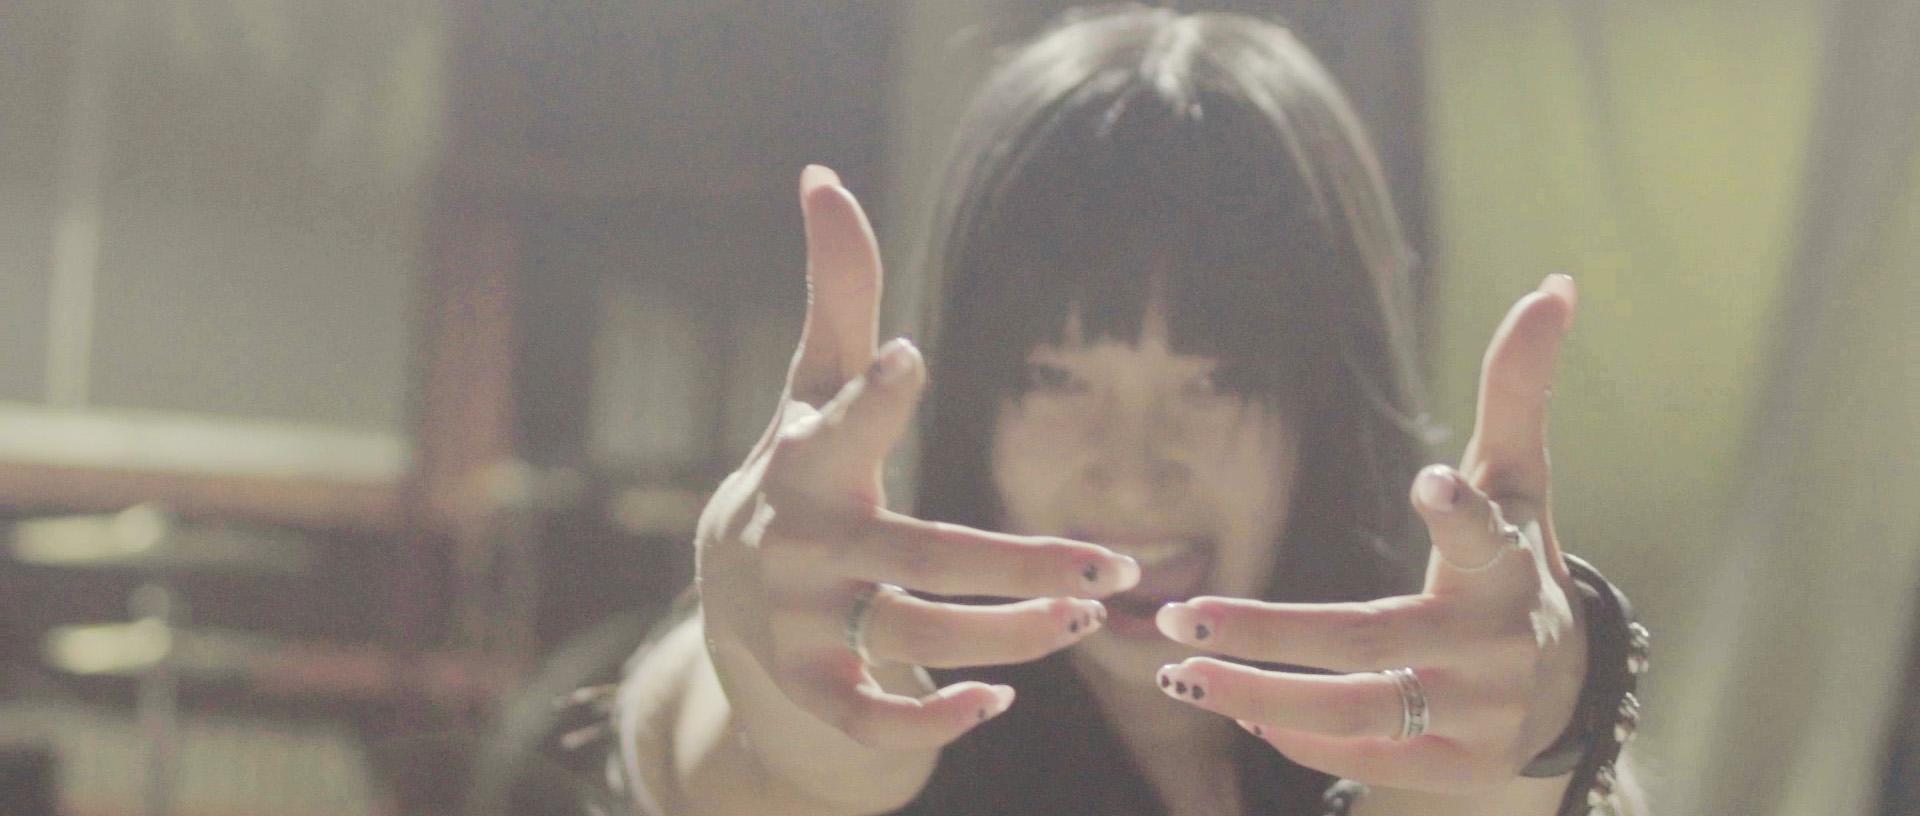 RMMS-BRATS-Nounai-Shoukyo-Game-MV-11